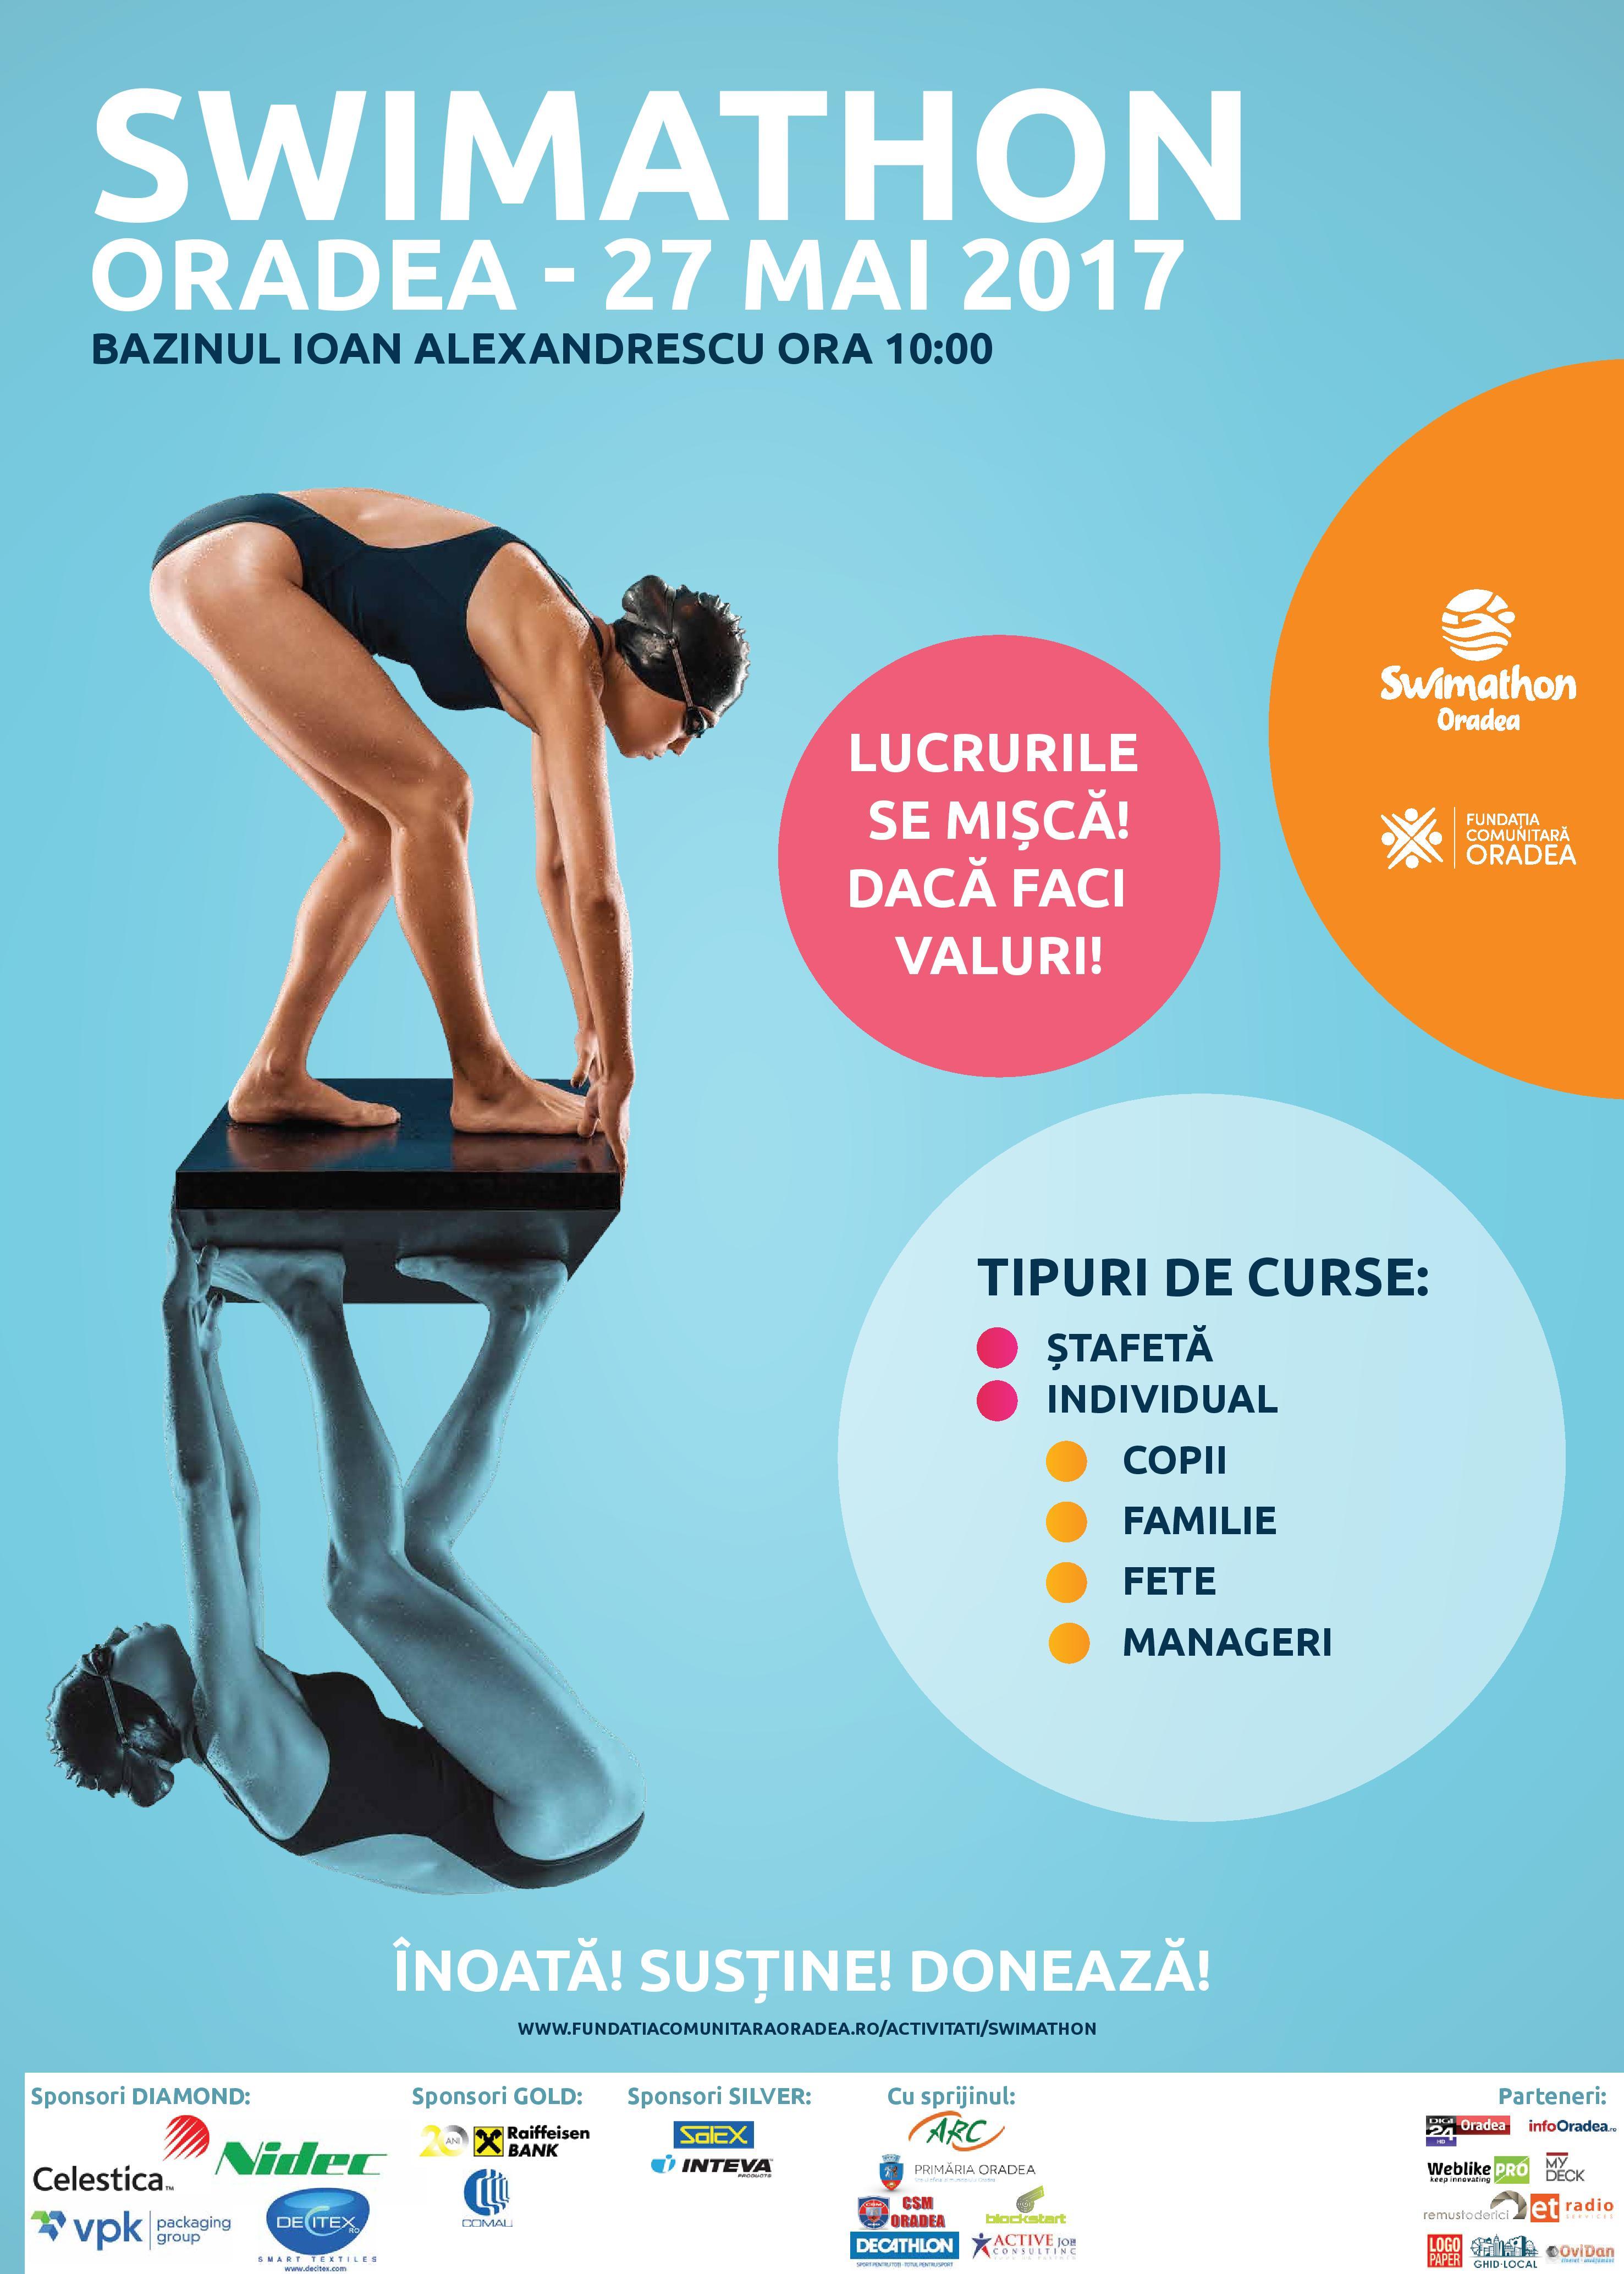 swimathon poster Oradea 2017